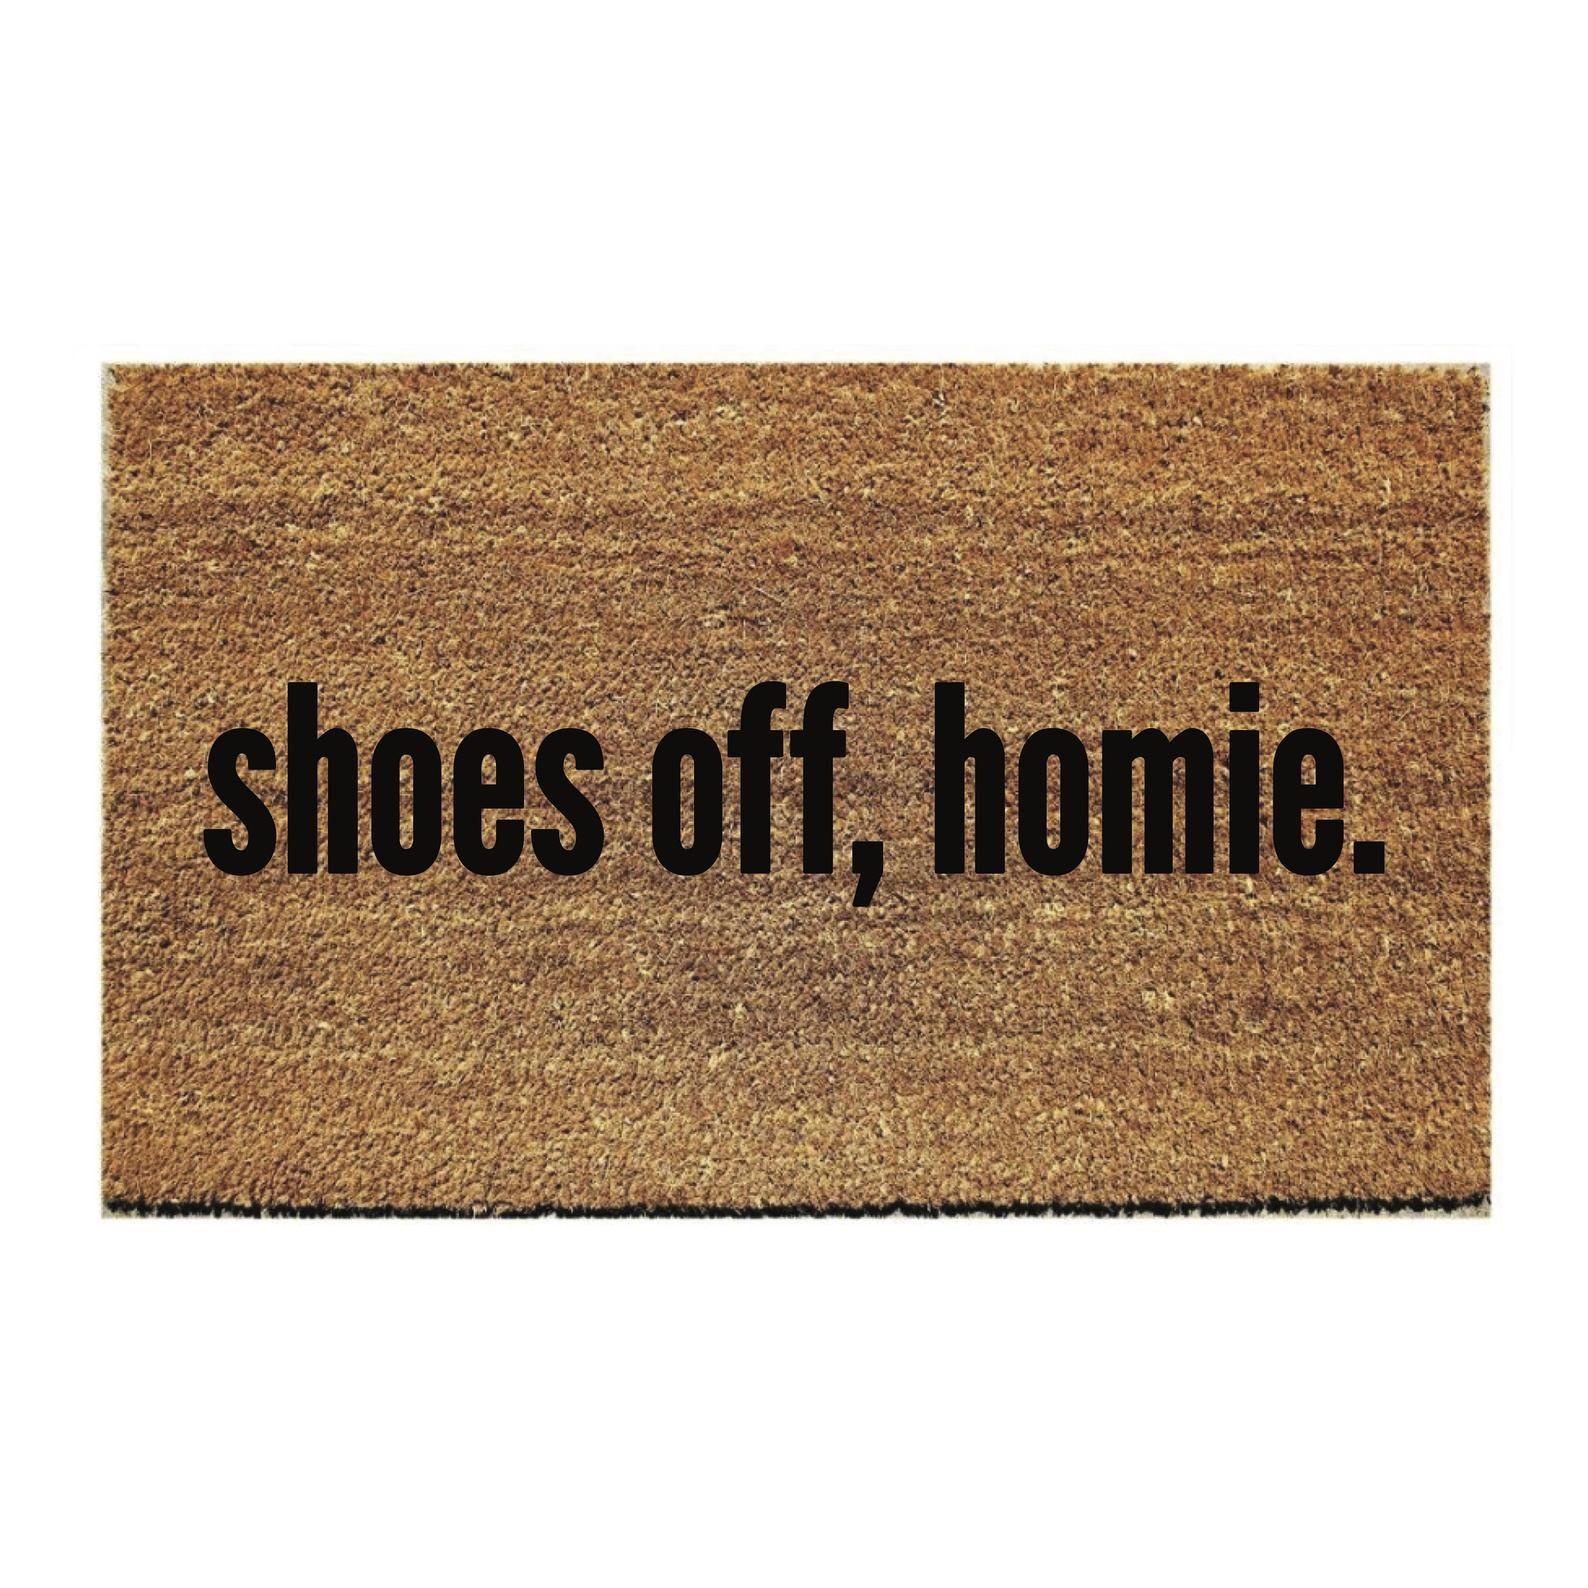 Custom Doormat Funny Shoes Off Homie With Images Custom Doormat Door Mat Funny Doormats